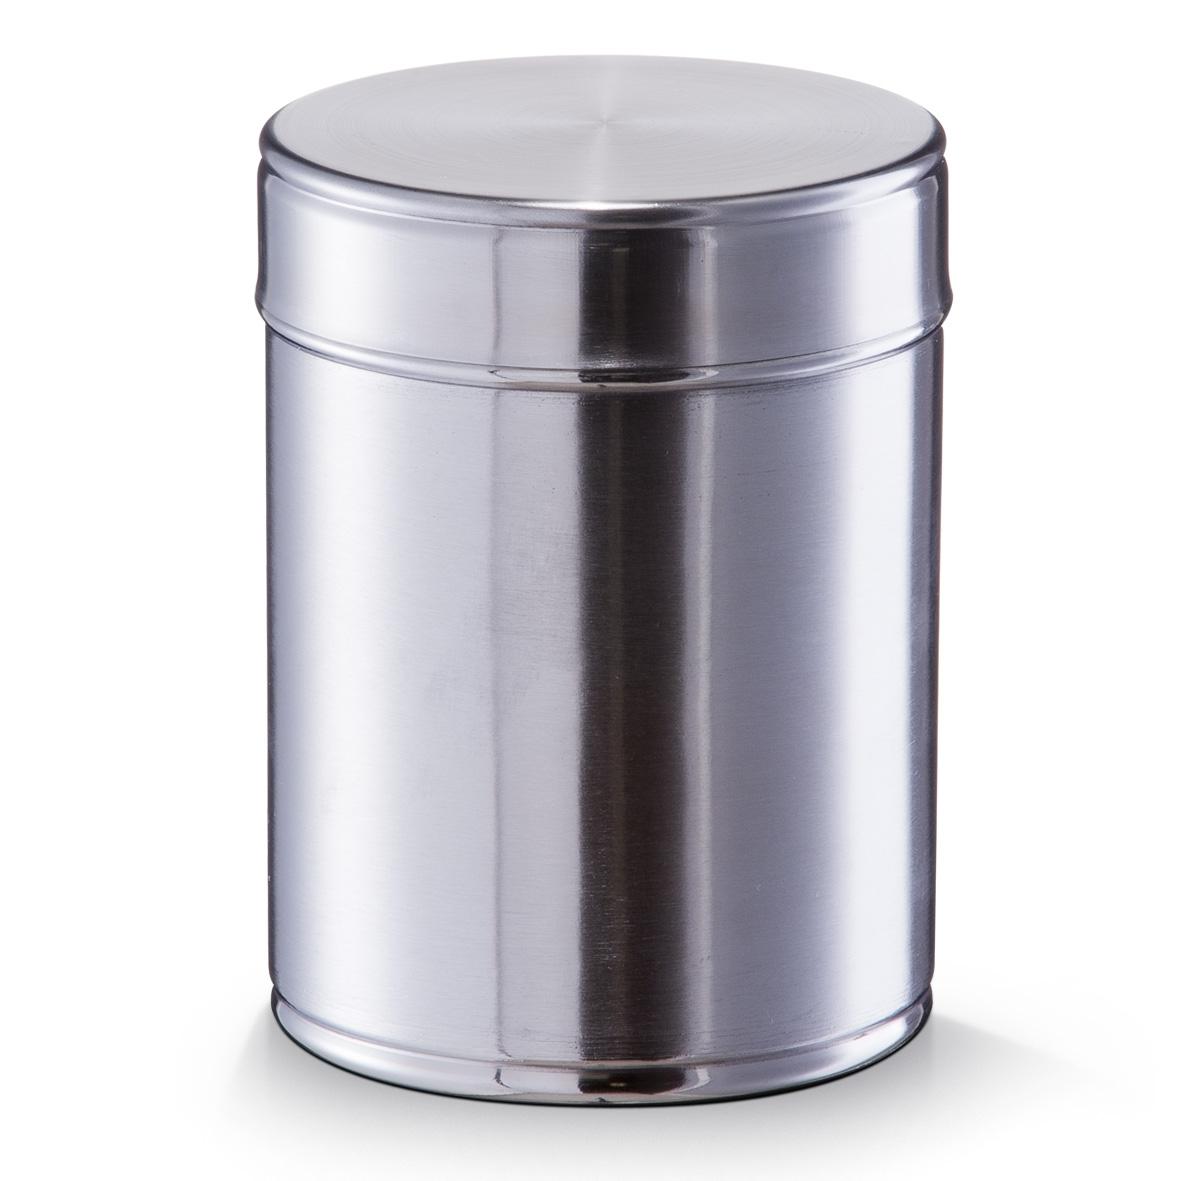 Recipient pentru depozitare din inox cu capac, 1400 ml, Ø 12xH15 cm imagine